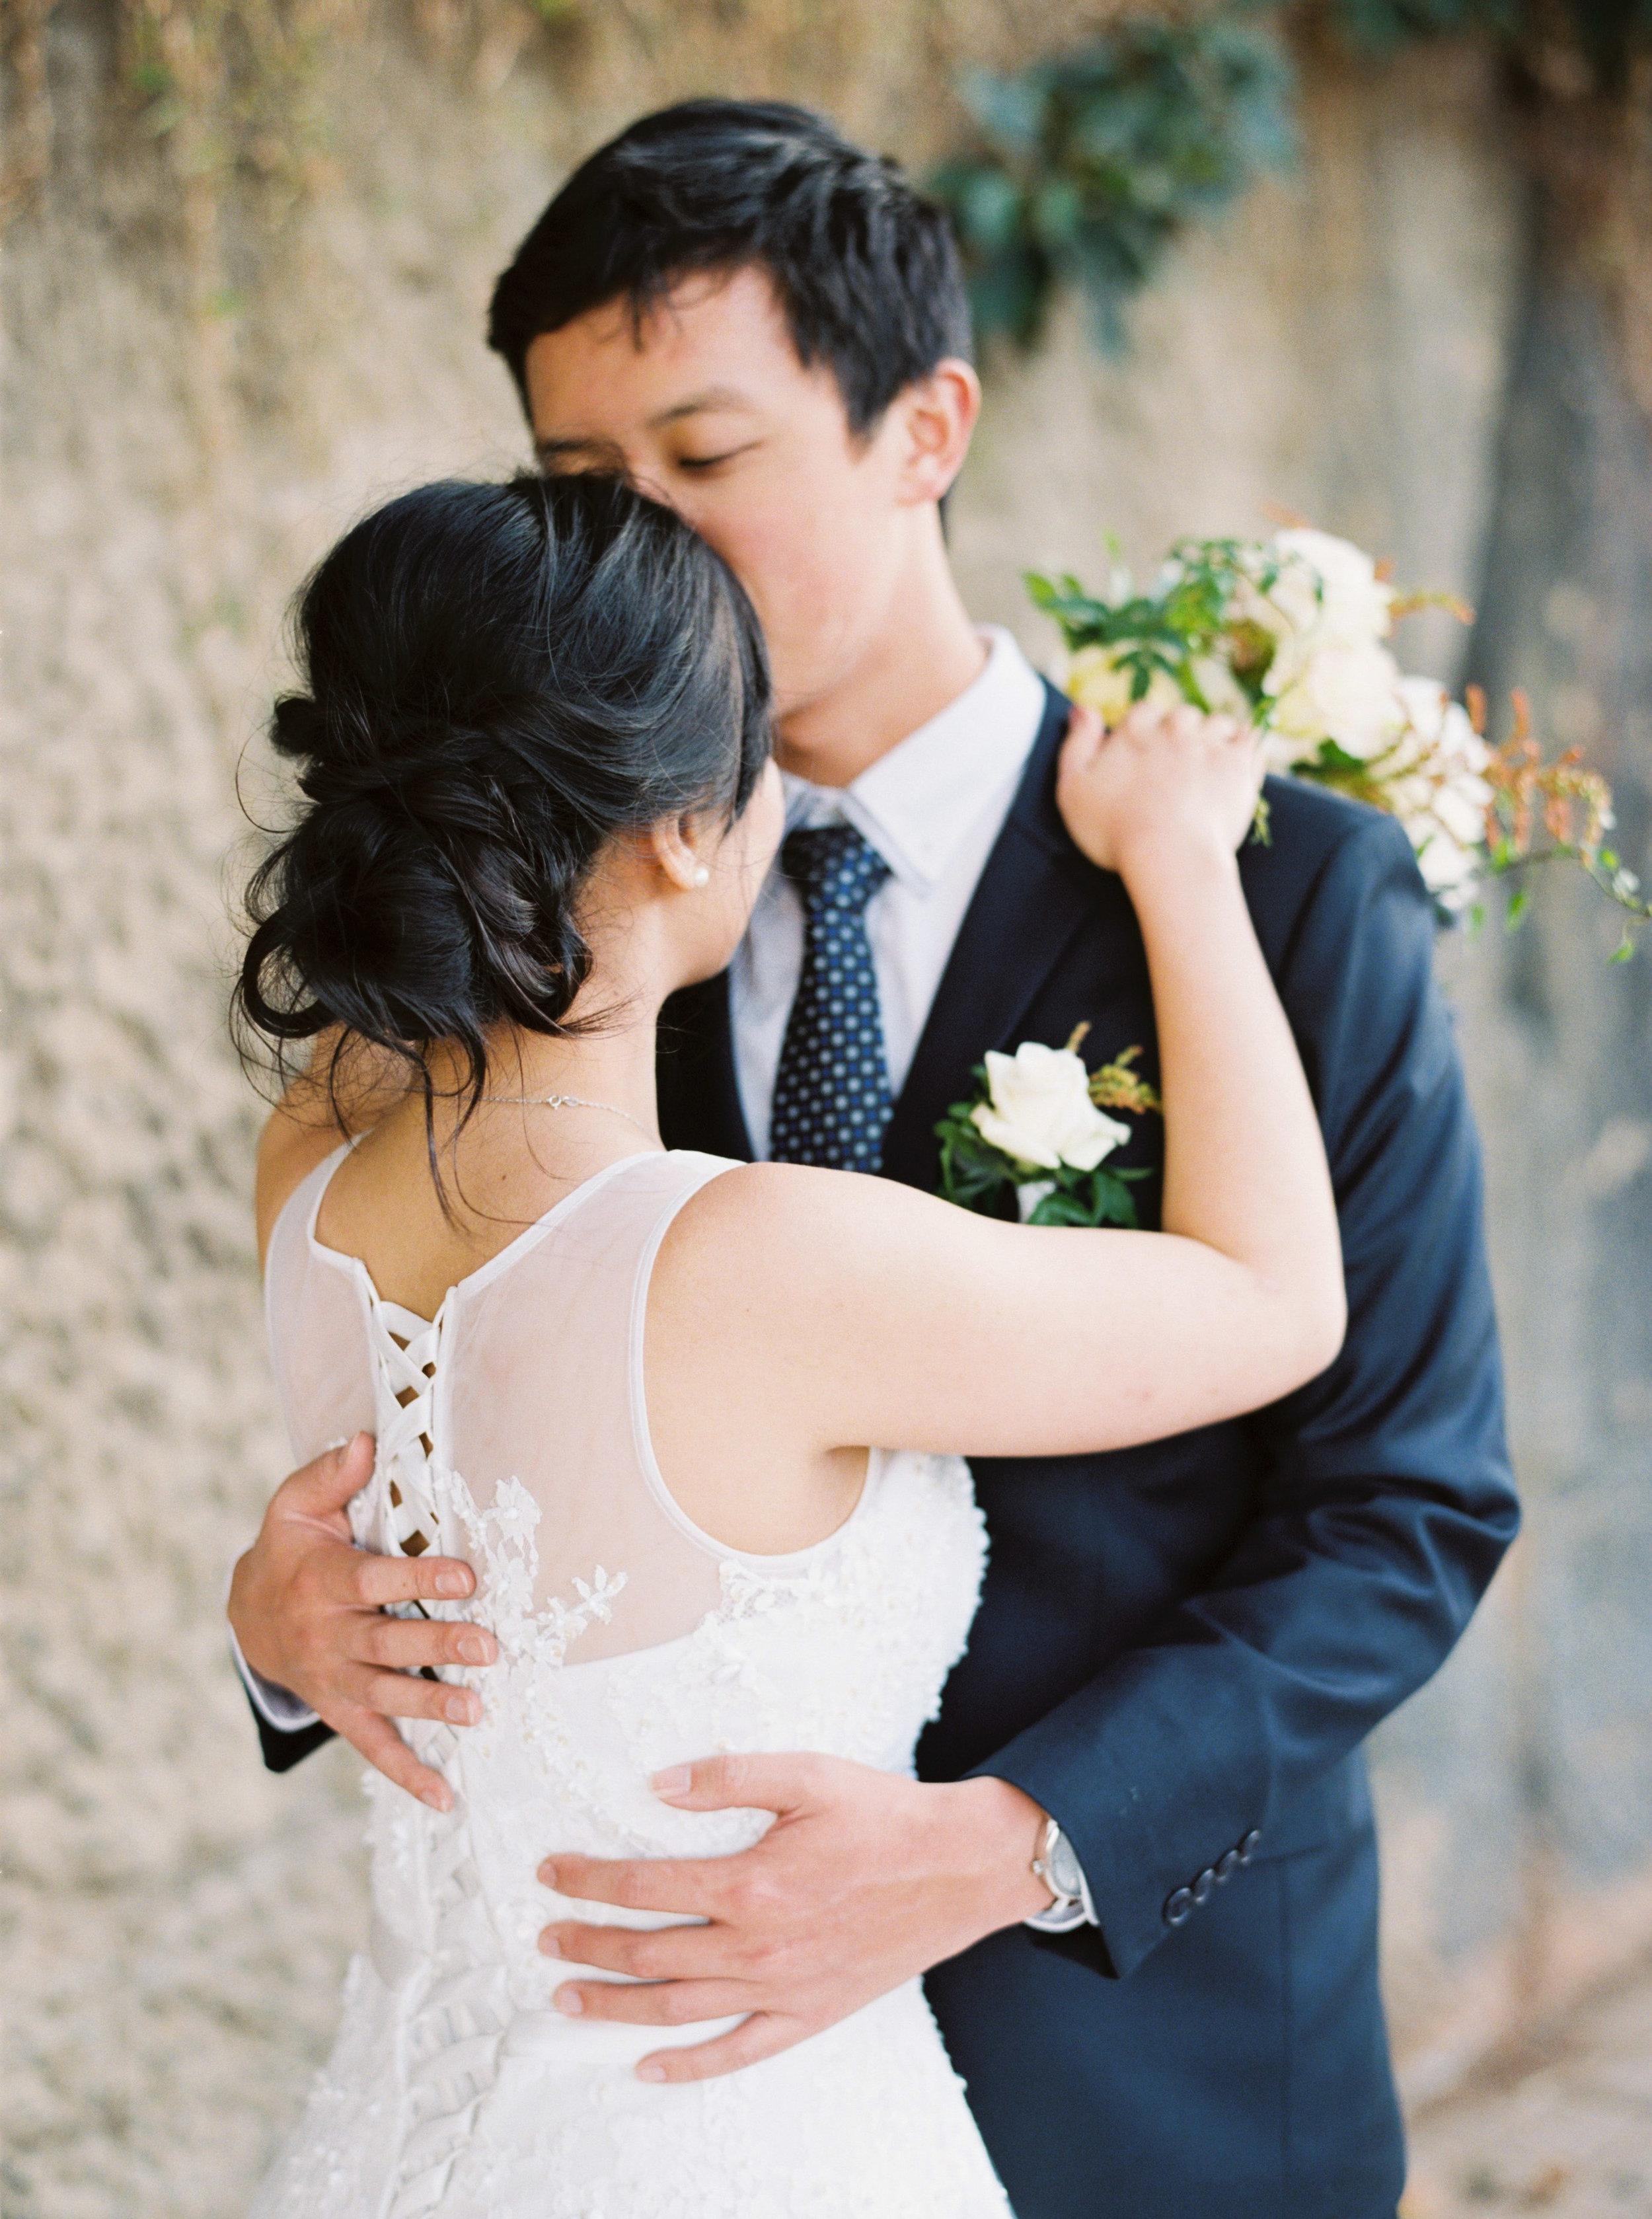 00002- Australia Sydney Wedding Photographer Sheri McMahon.jpg